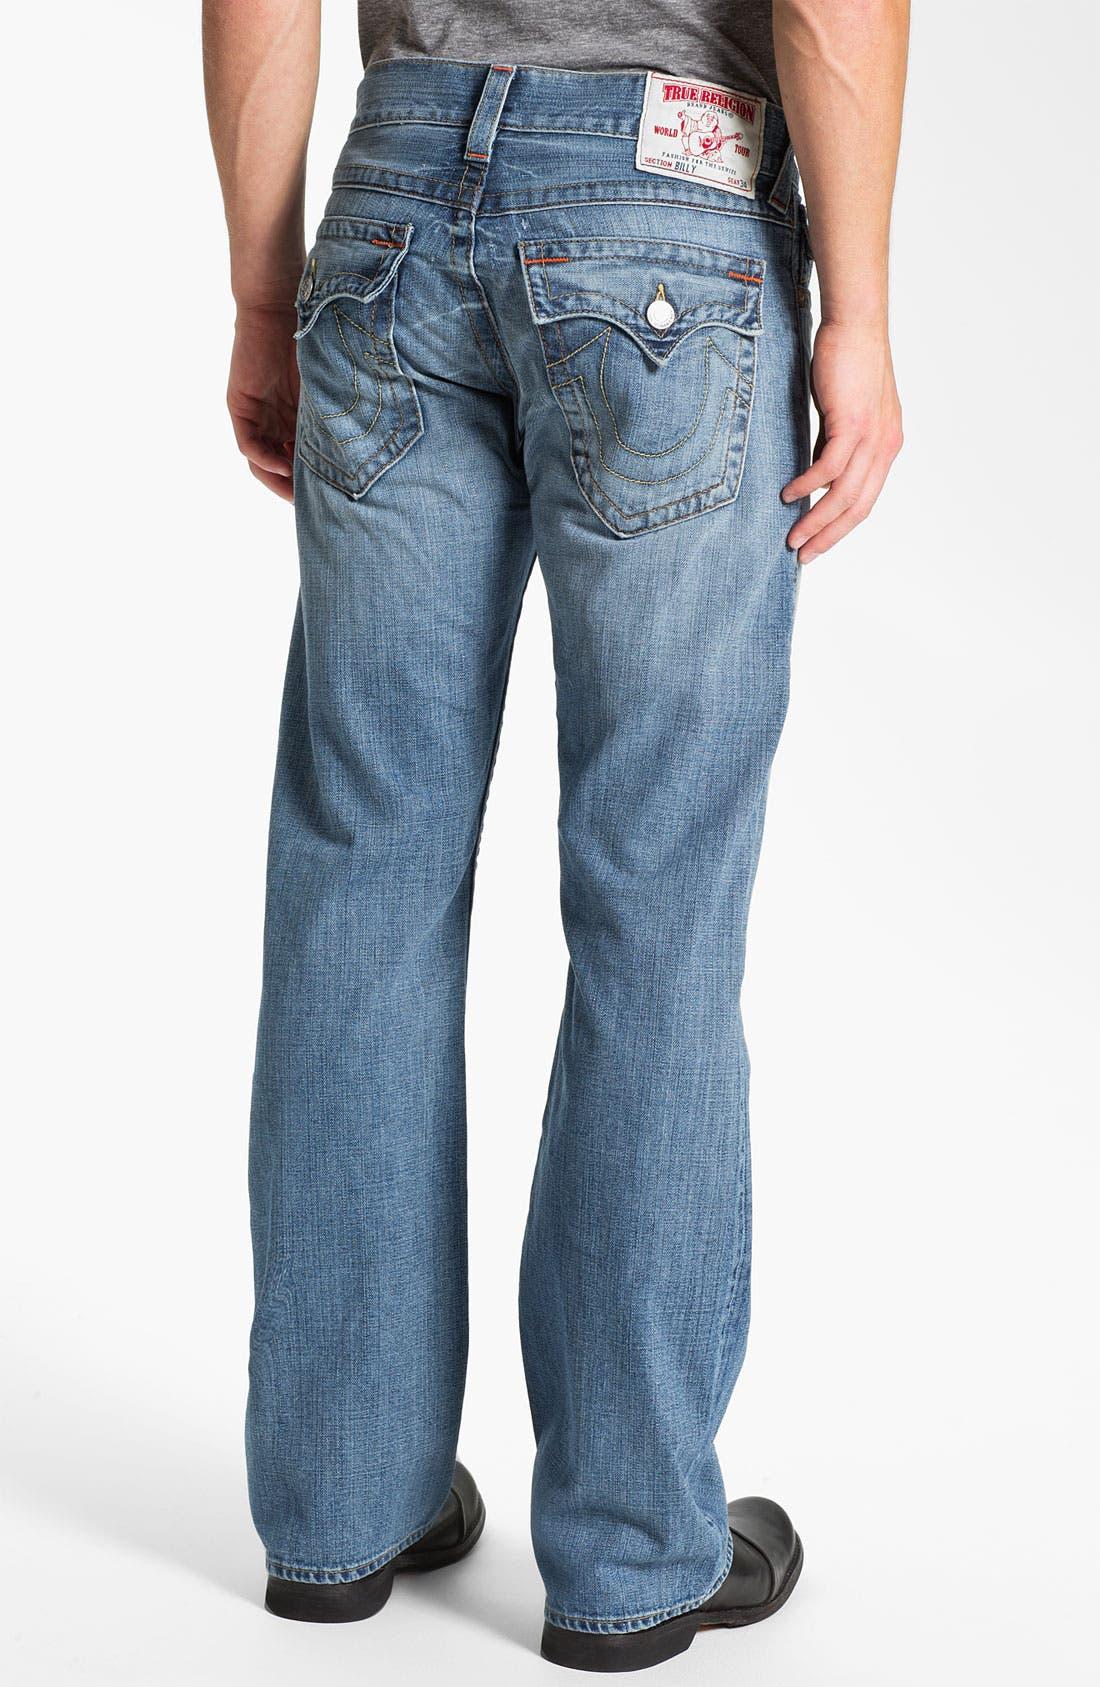 Main Image - True Religion Brand Jeans 'Billy' Bootcut Jeans (Vam Shade Horizon)